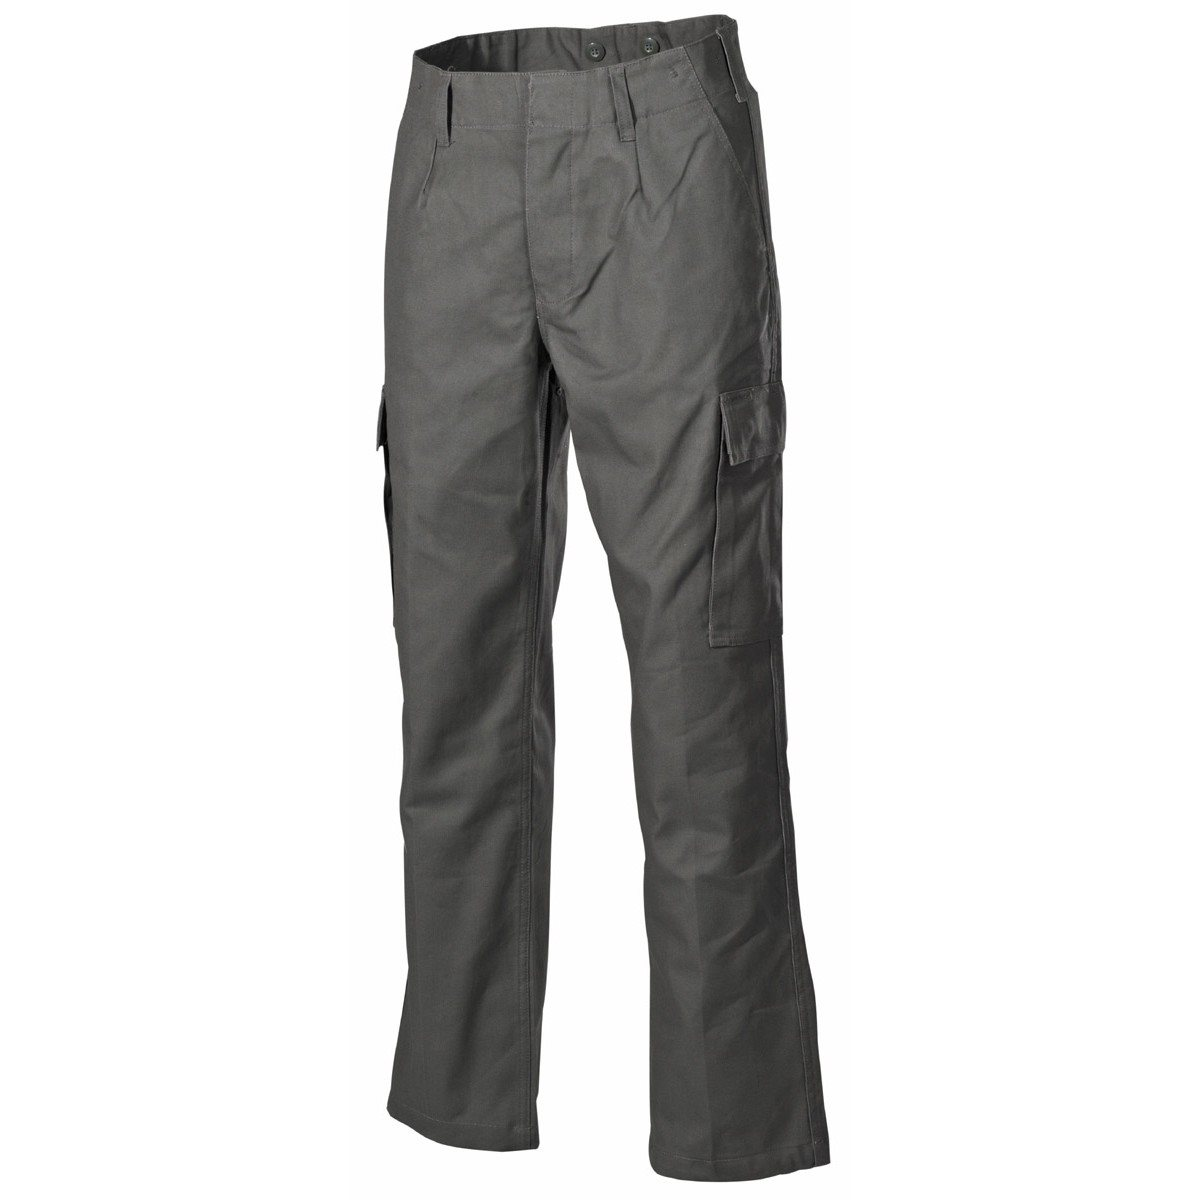 BW moleskin pants OLIVE MFH int. comp. 01102B L-11